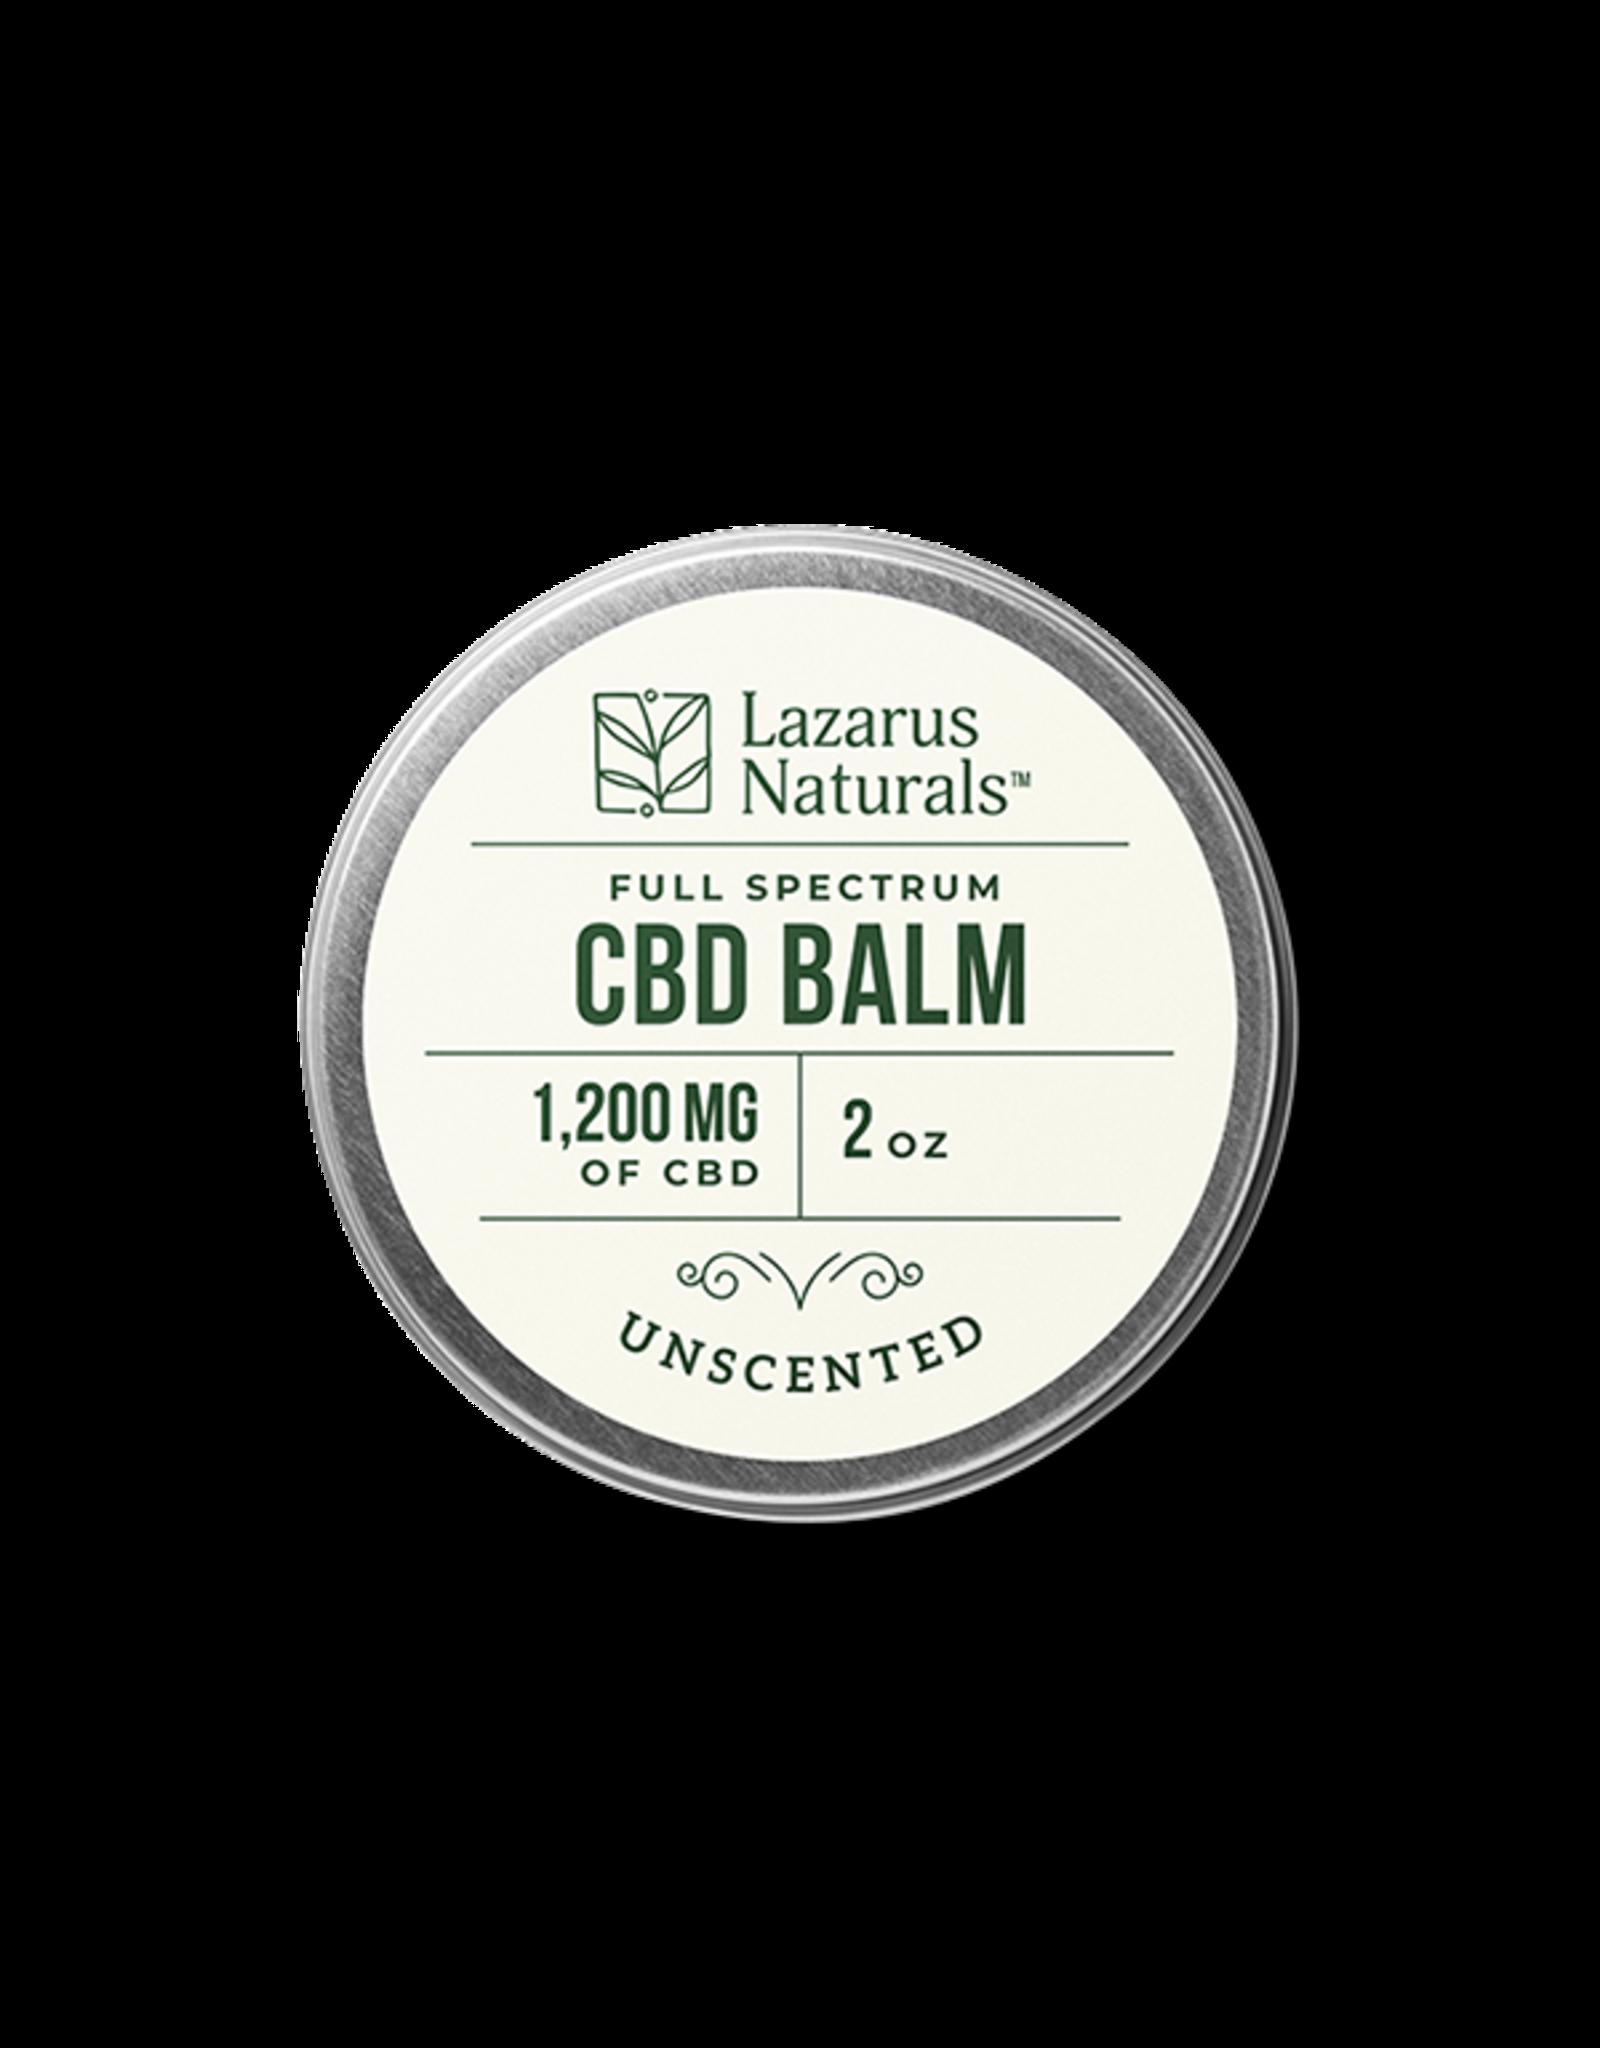 Lazarus Naturals Lazarus Naturals unscented balm 1200 mg